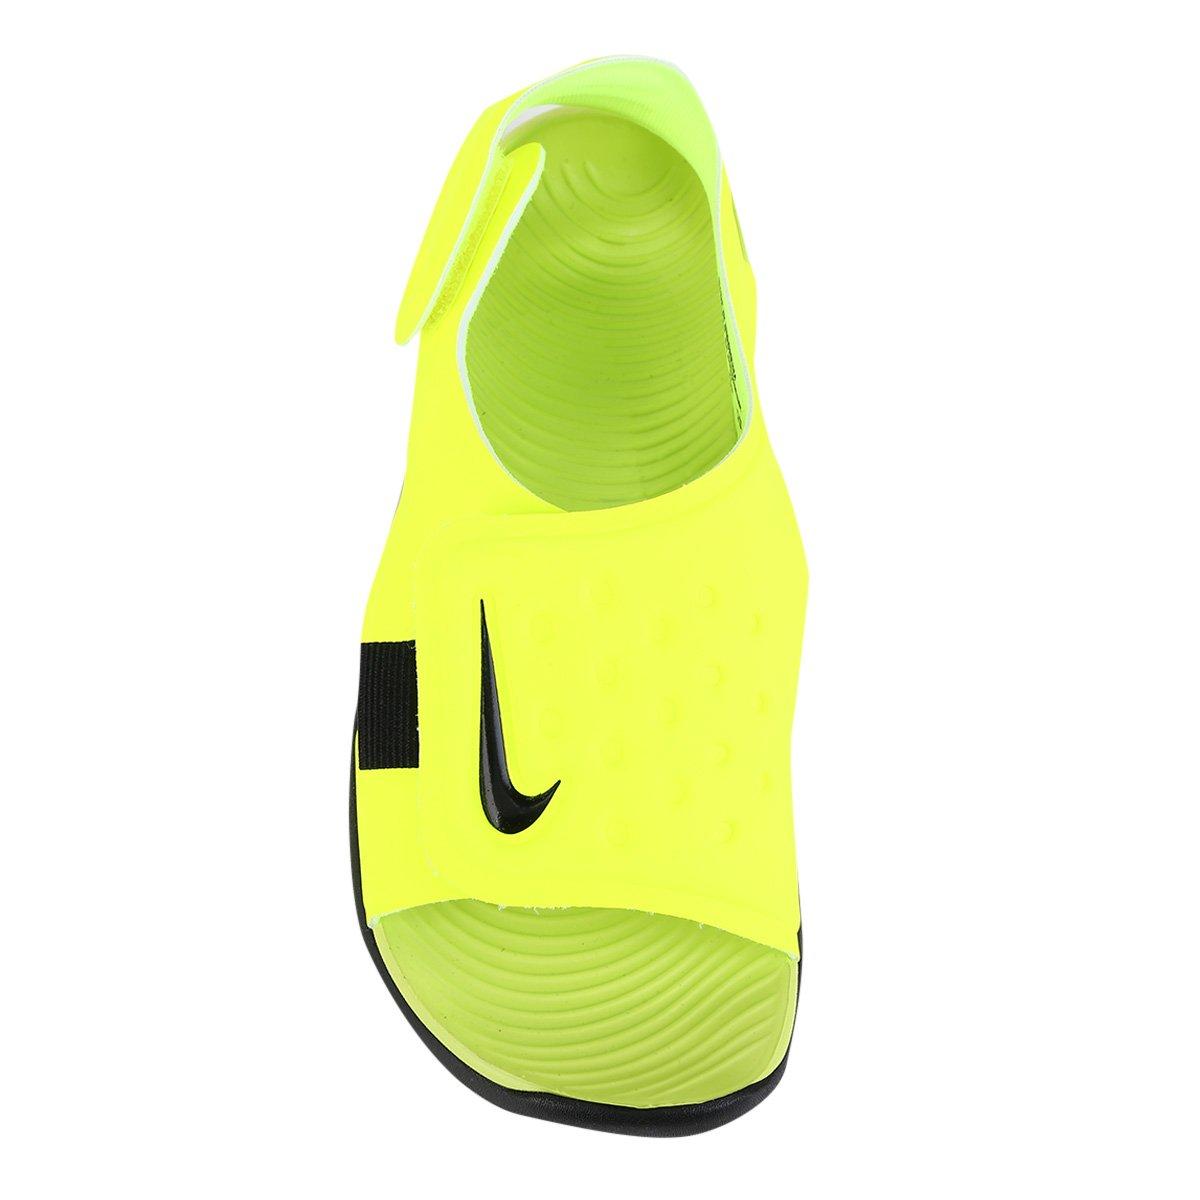 Sandália Infantil Nike Sunray Adjust 5 - Tam: 31 - 2